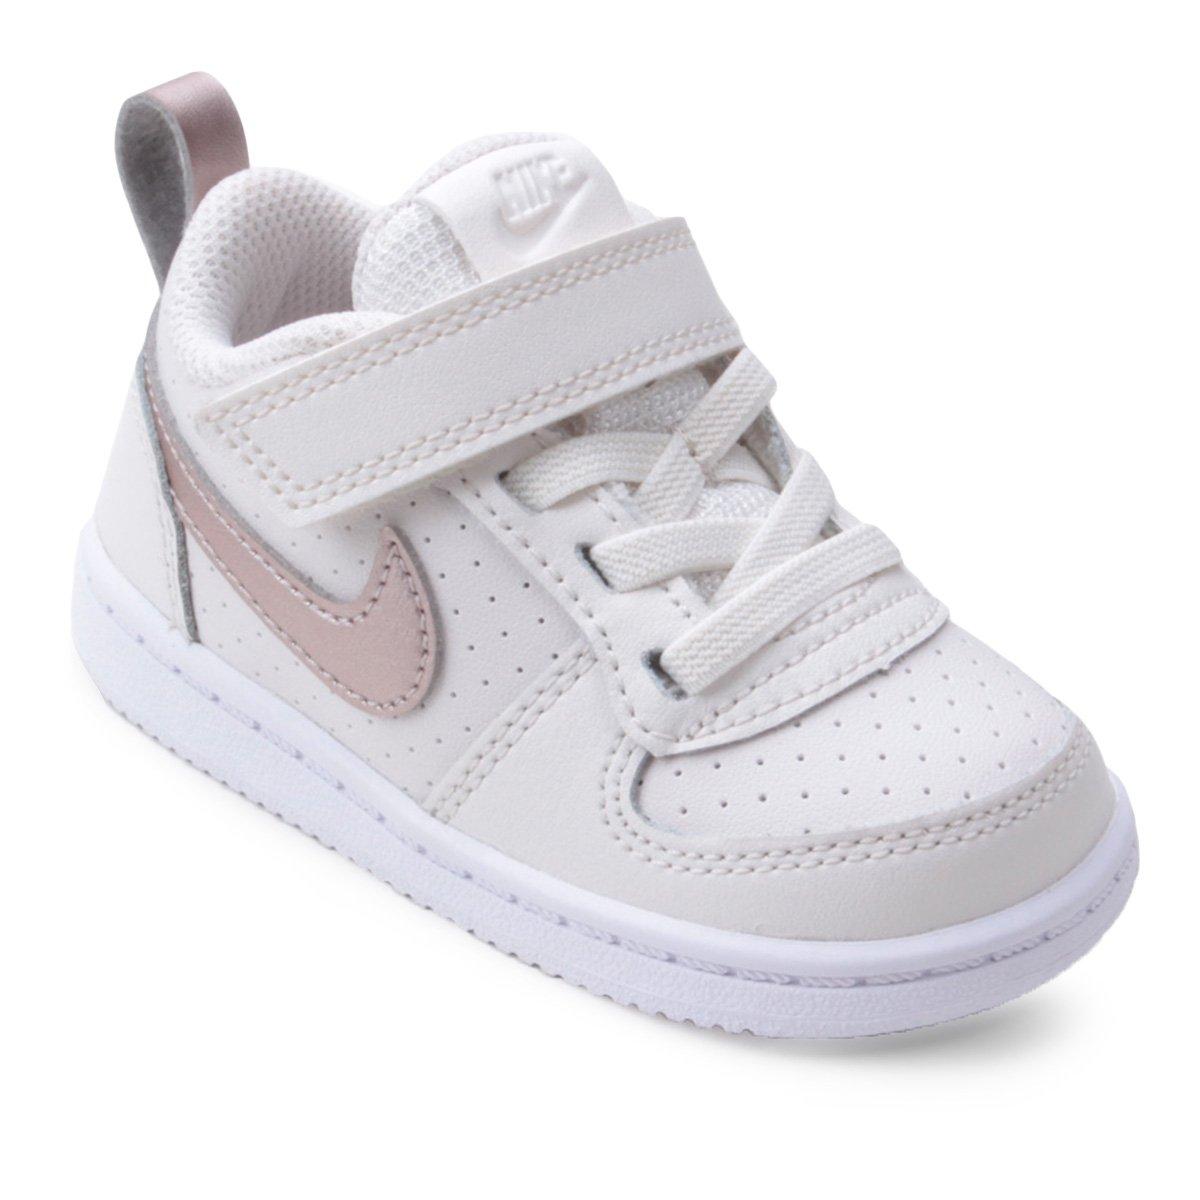 Tênis Nike Infantil Court Borough Low Feminino - Amarelo e Branco ... b2e5d0fdf1eeb